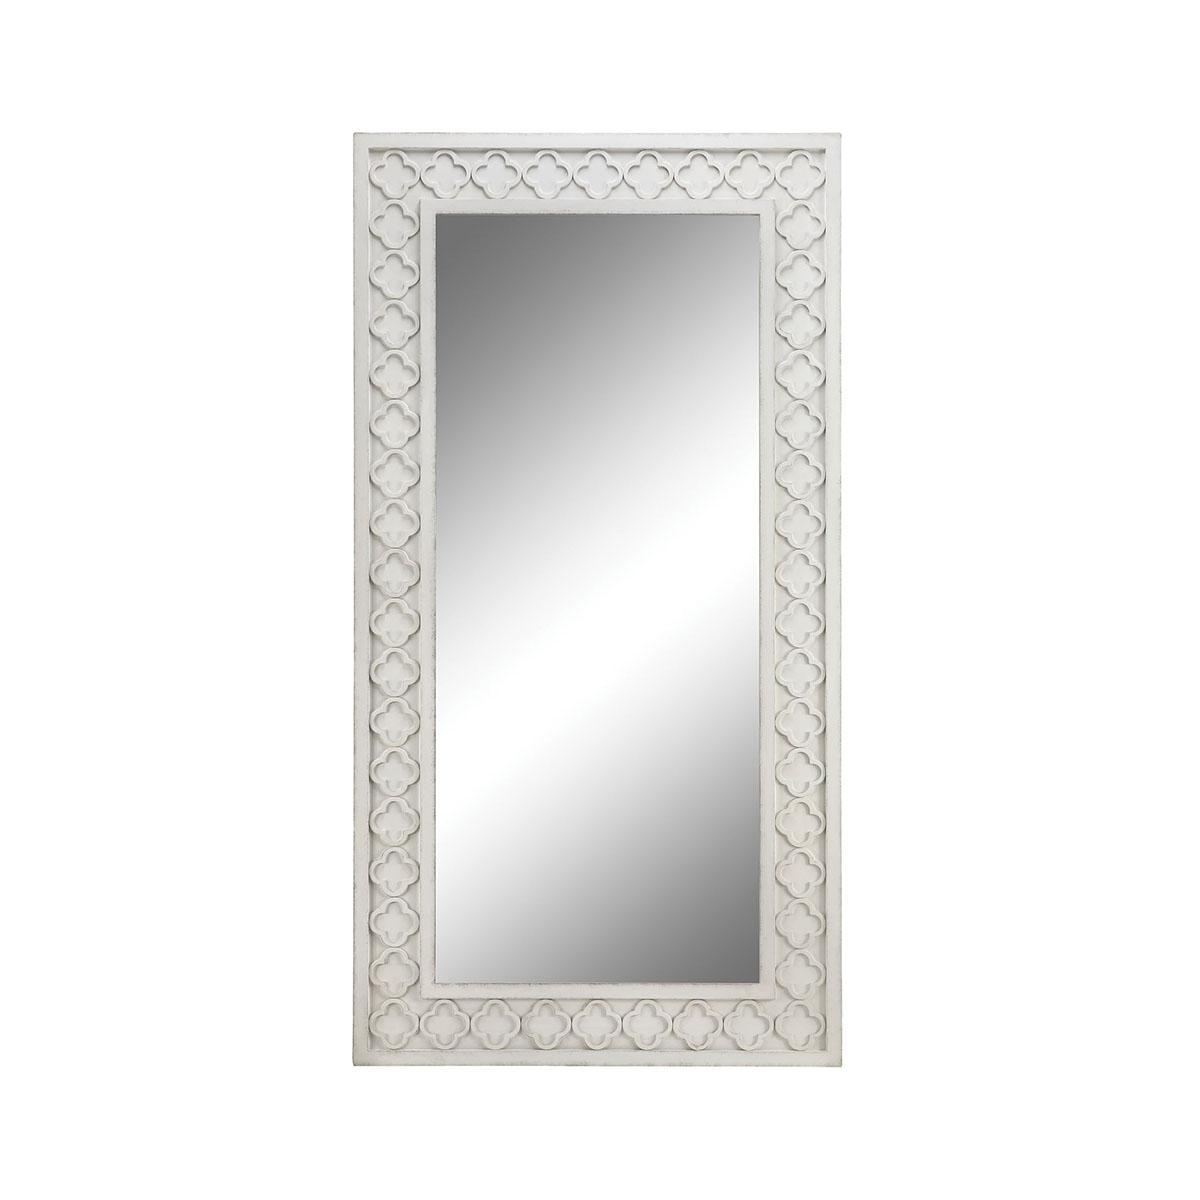 Edwina Mirror | Stein World